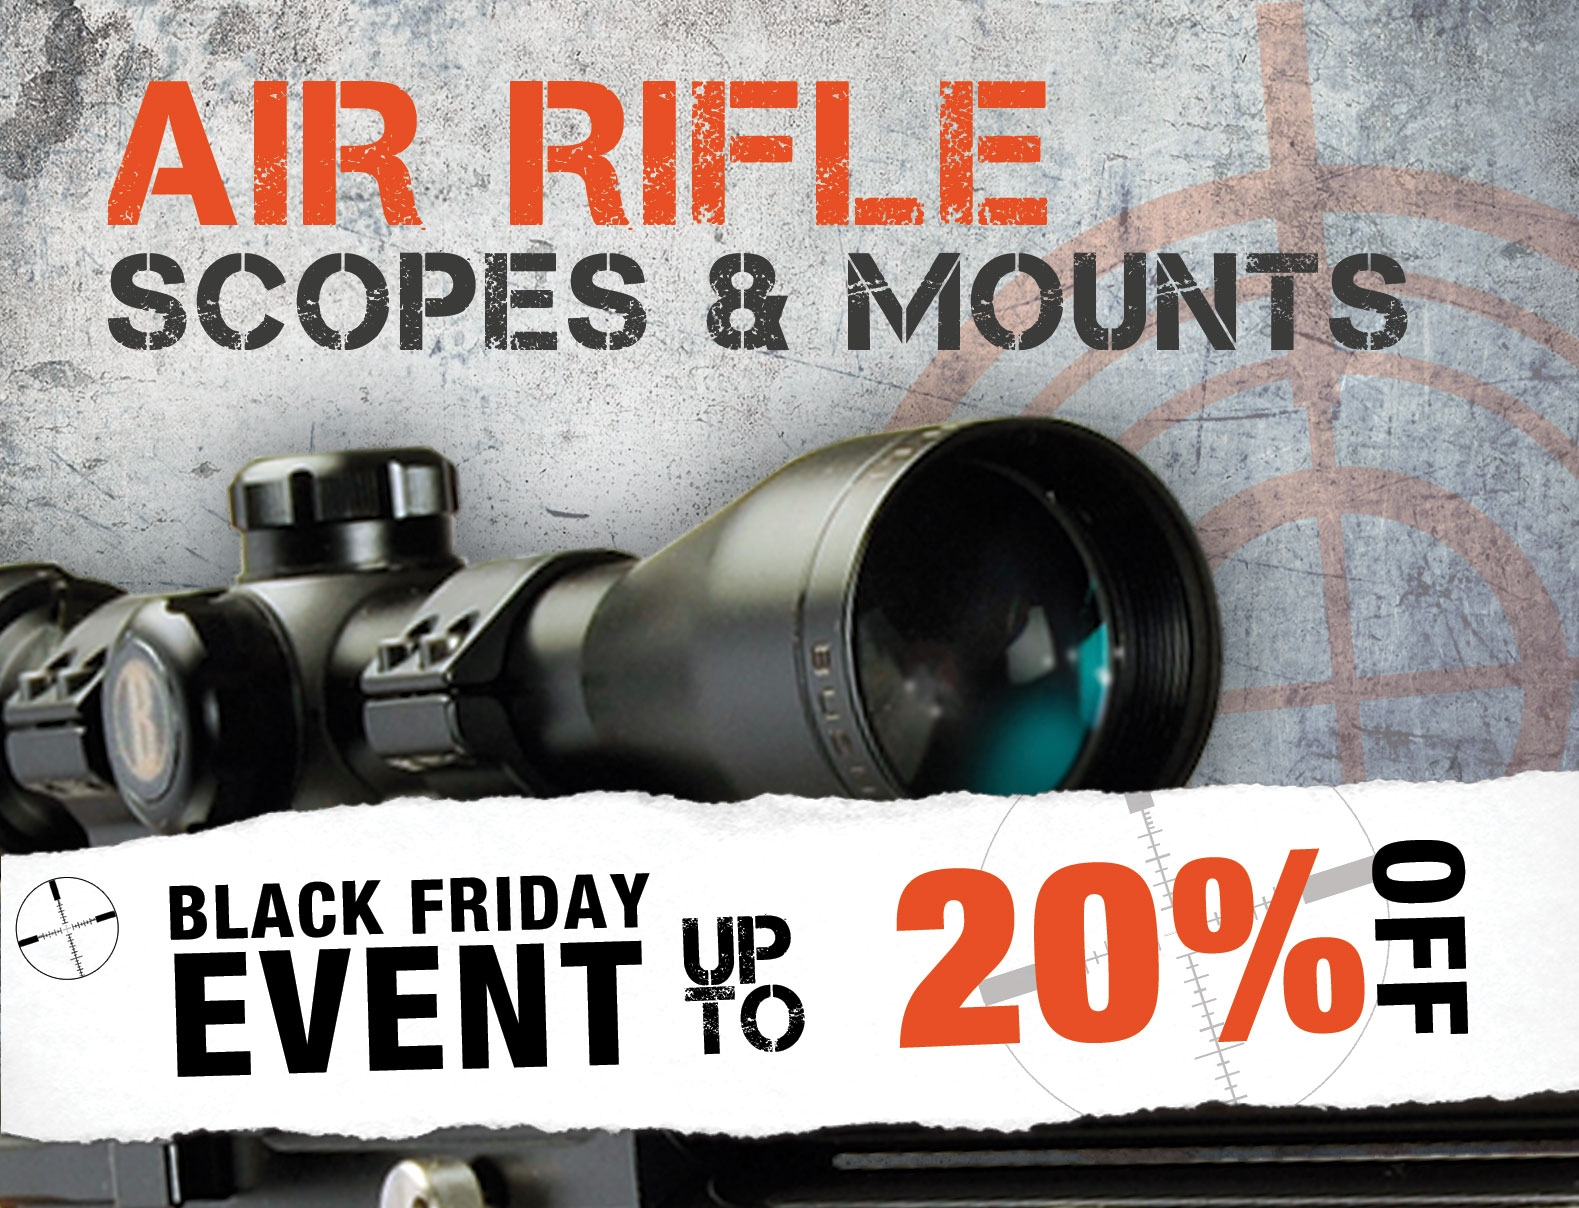 Air Rifle Scopes & Mounts